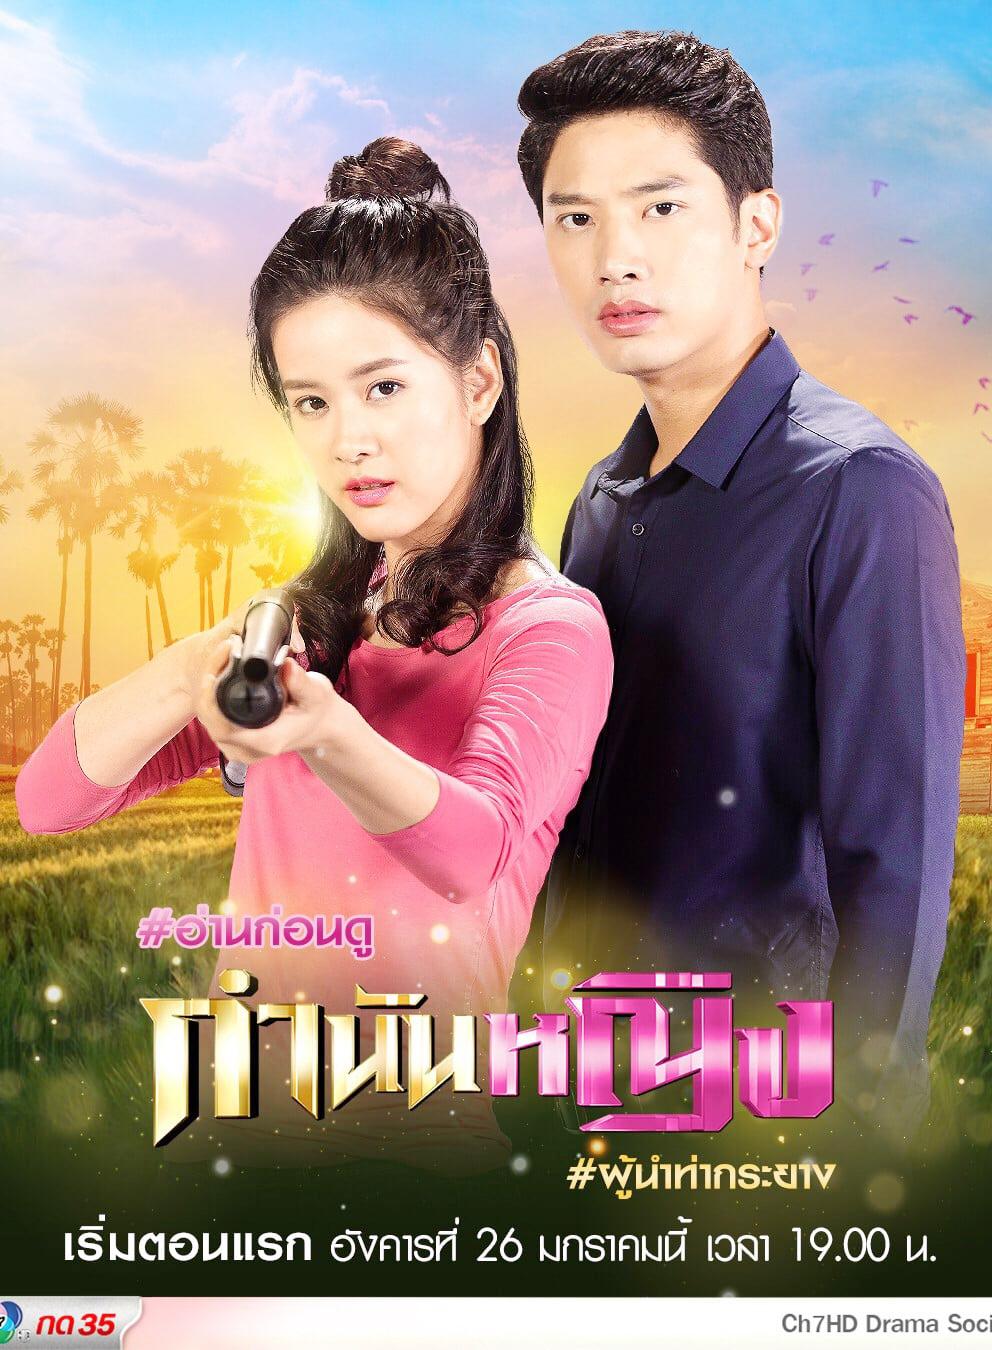 Kamnan Ying, กำนันหญิง, Thai Drama, thaidrama, thailakorn, thailakornvideos, thaidrama2021, malimar tv, meelakorn, lakornsod, klook, seesantv, viu, raklakorn, dramacool